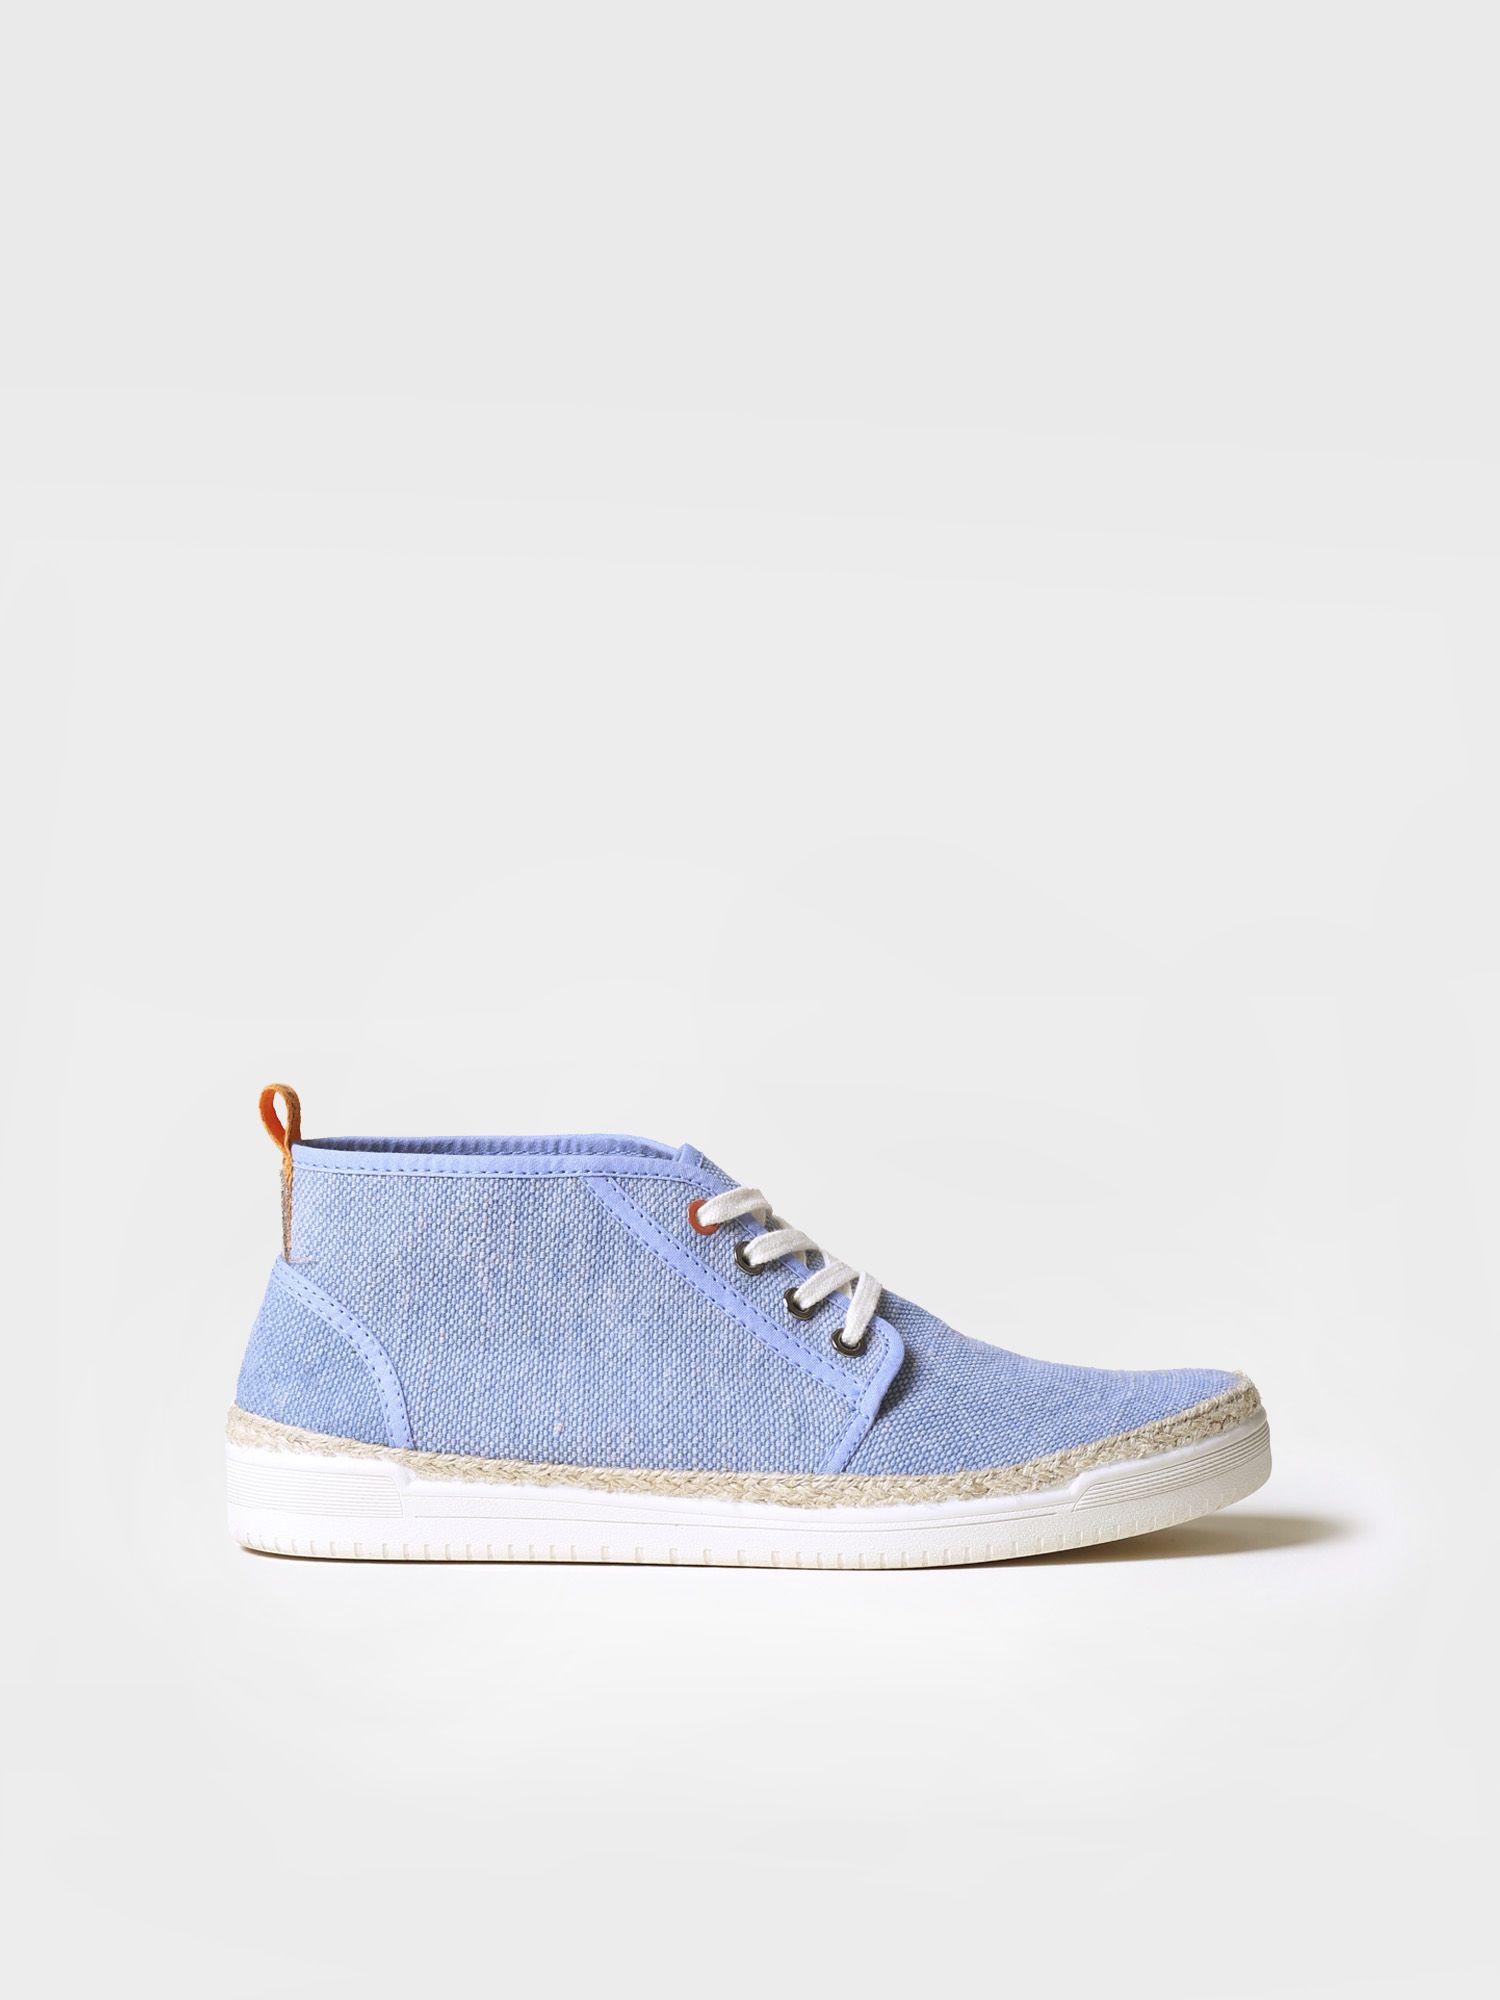 High top sneaker with laces - BONO-SU